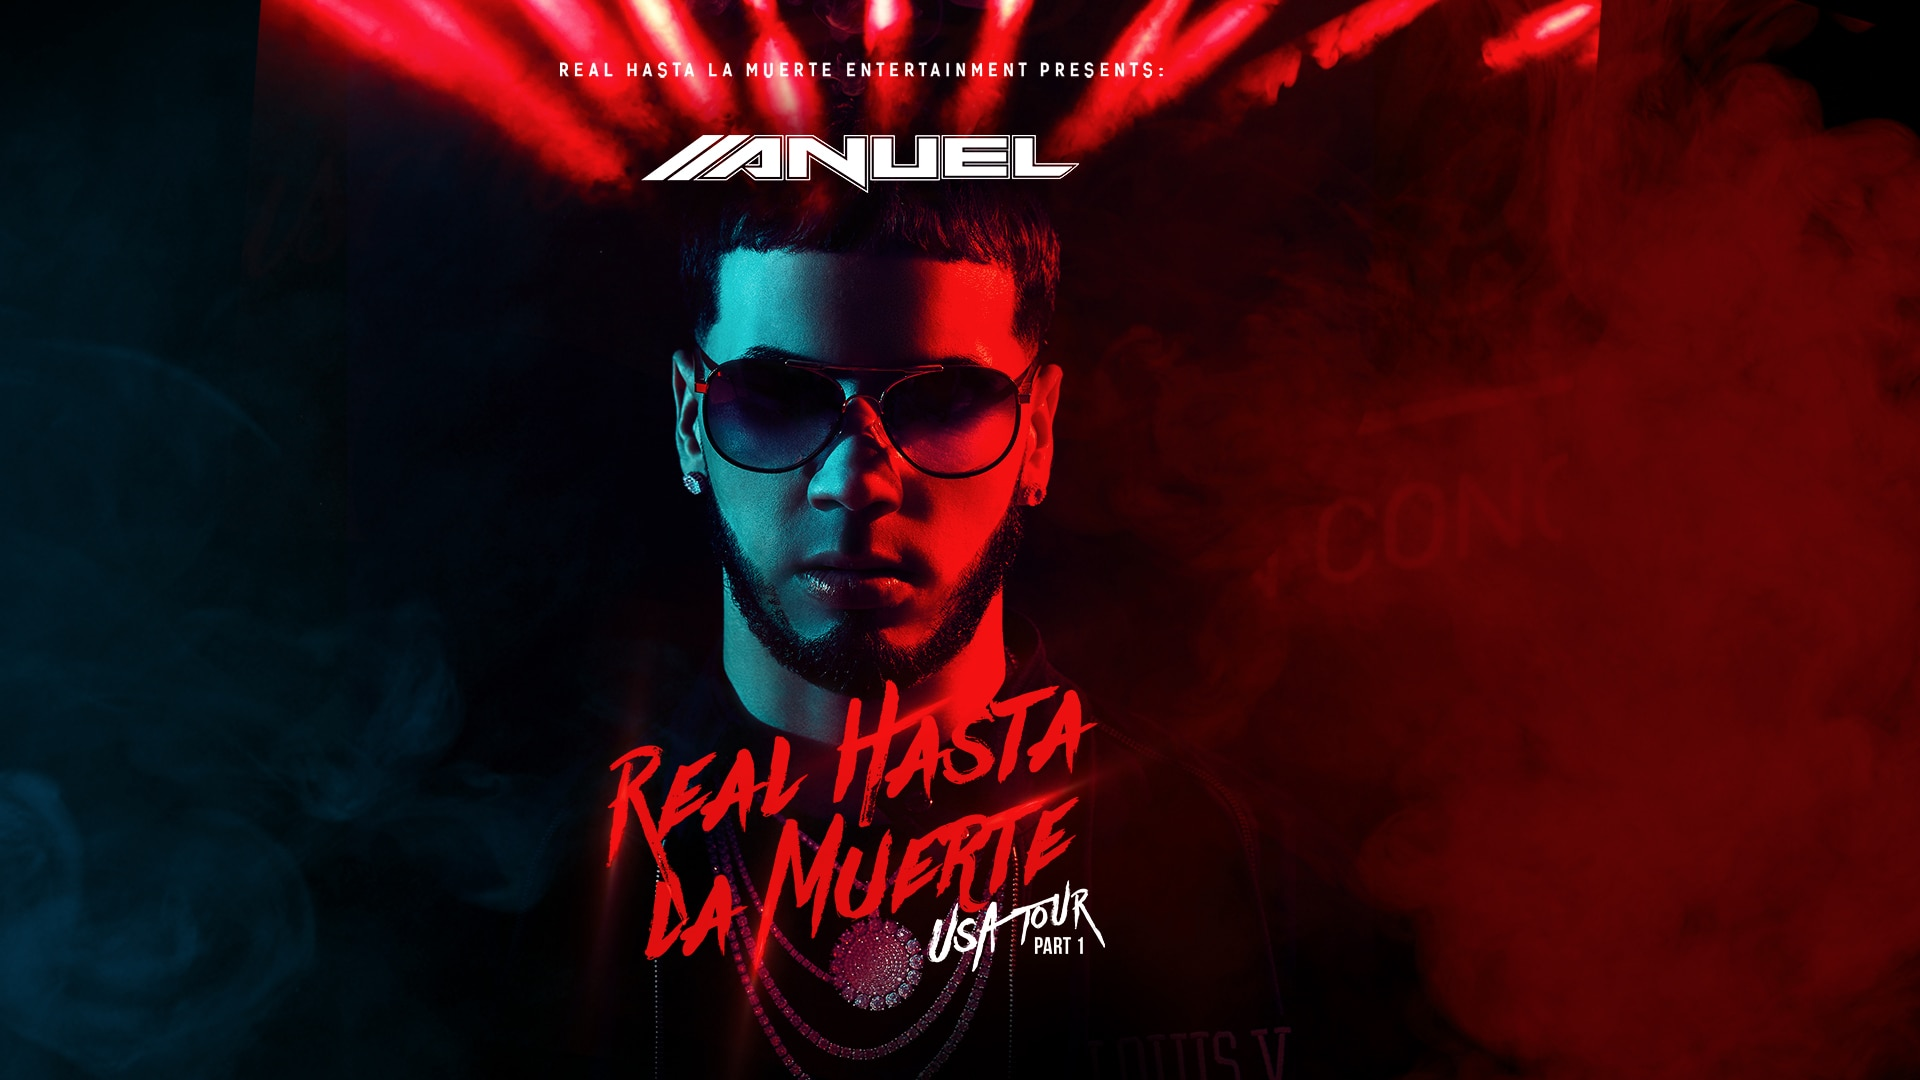 Anuel AA - Real Hasta La Muerta Tour